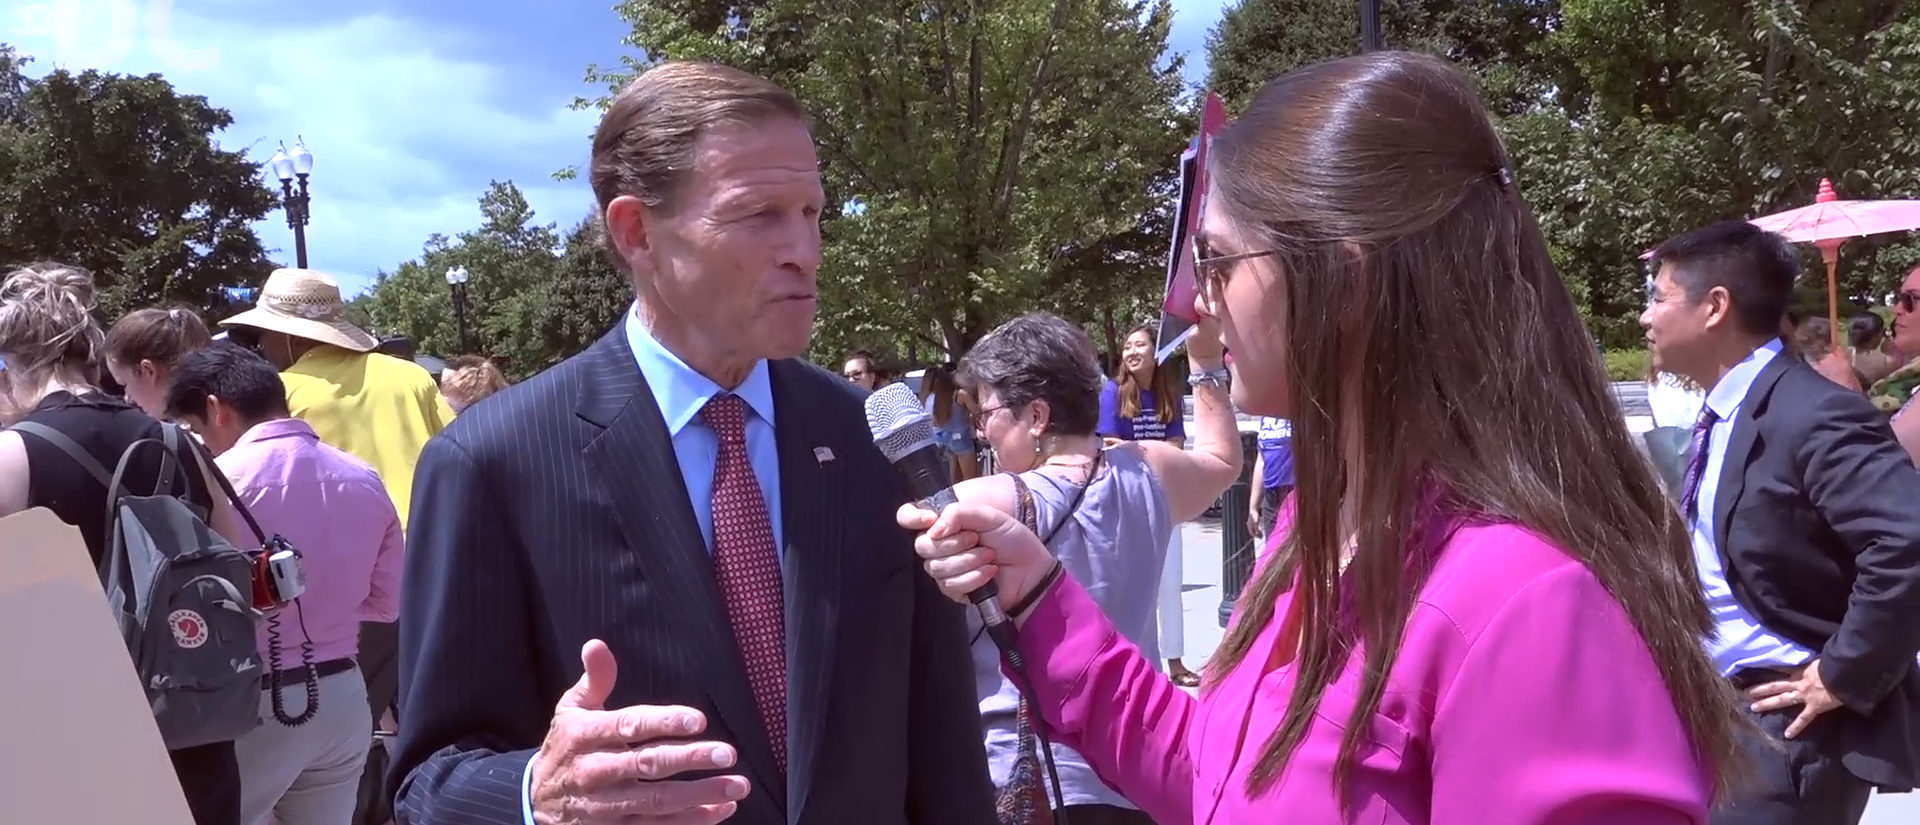 Amber Athey Interviews Sen. Richard Blumenthal (June 28, 2018)